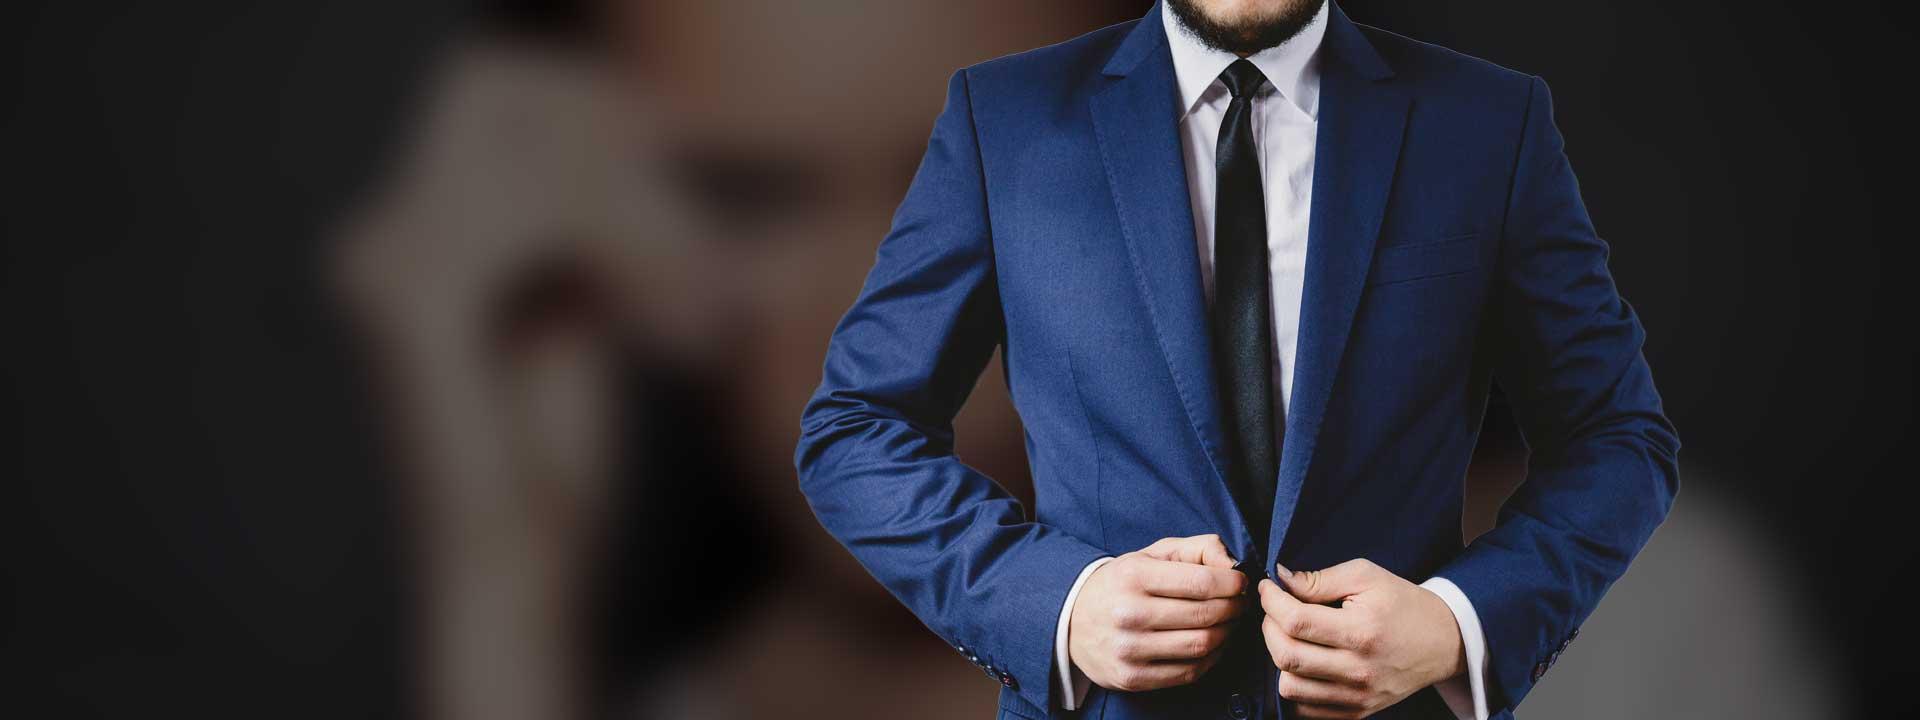 Custom Made Tailors Fabrics Fashions